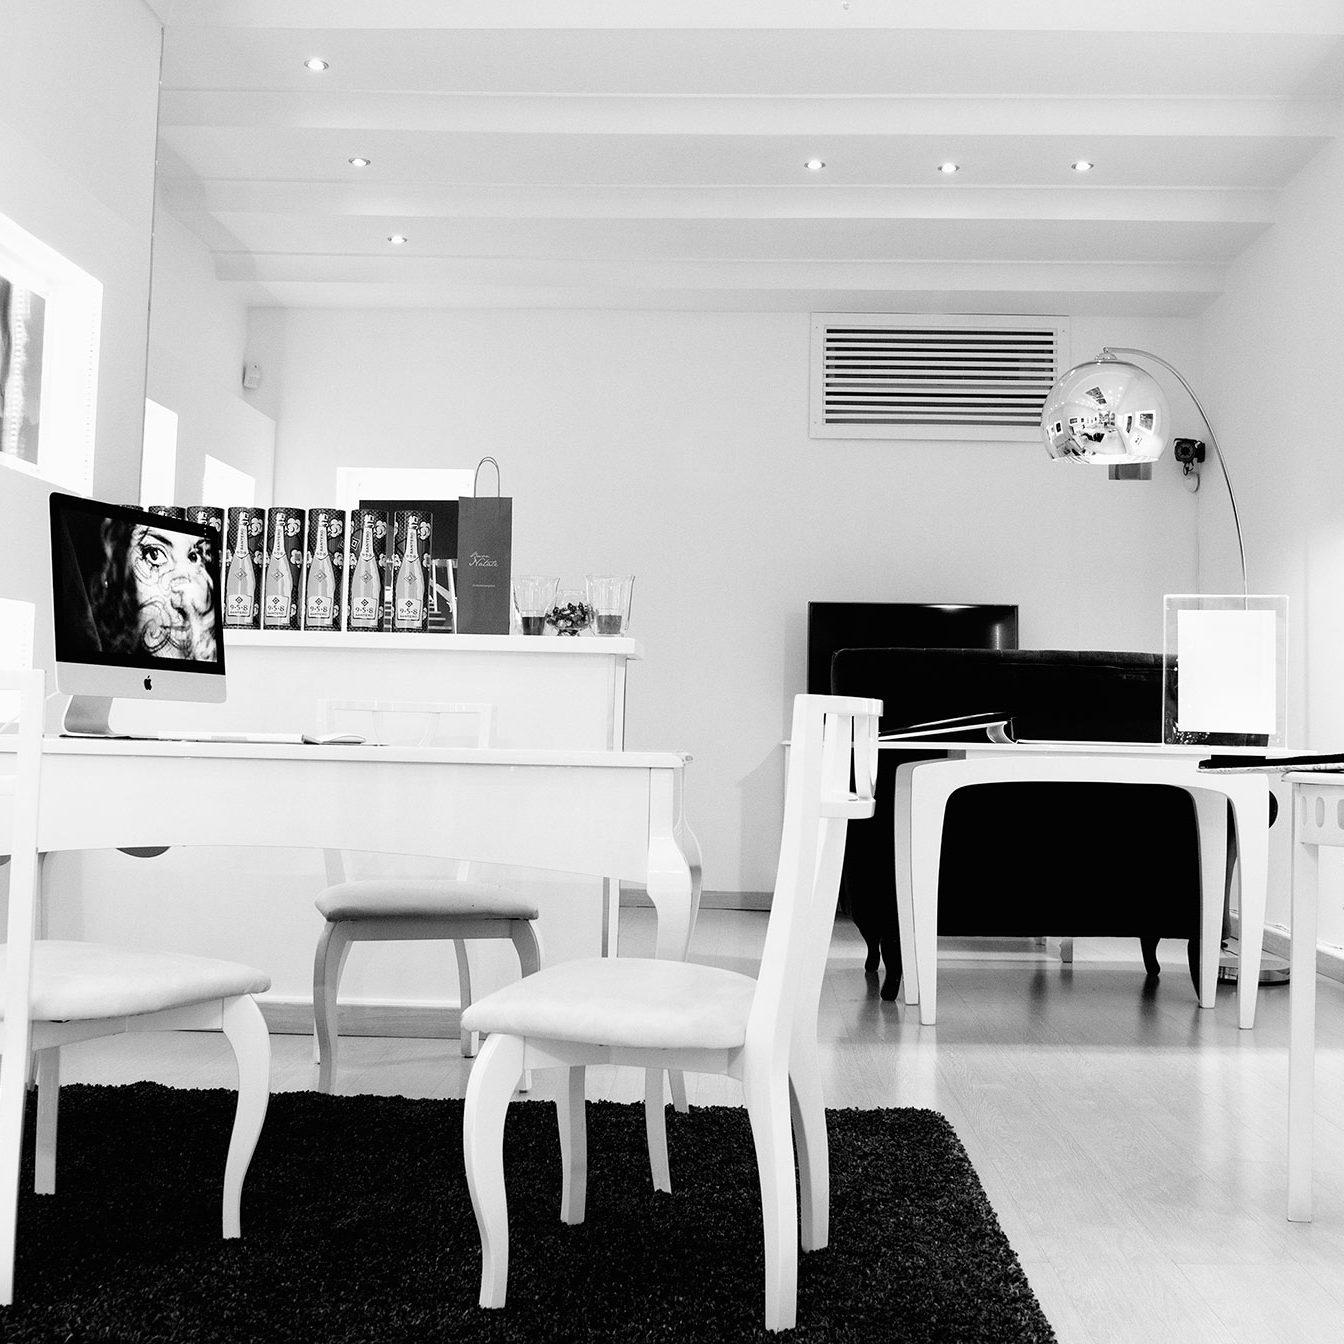 studio-darcangelo-fotografia-formia